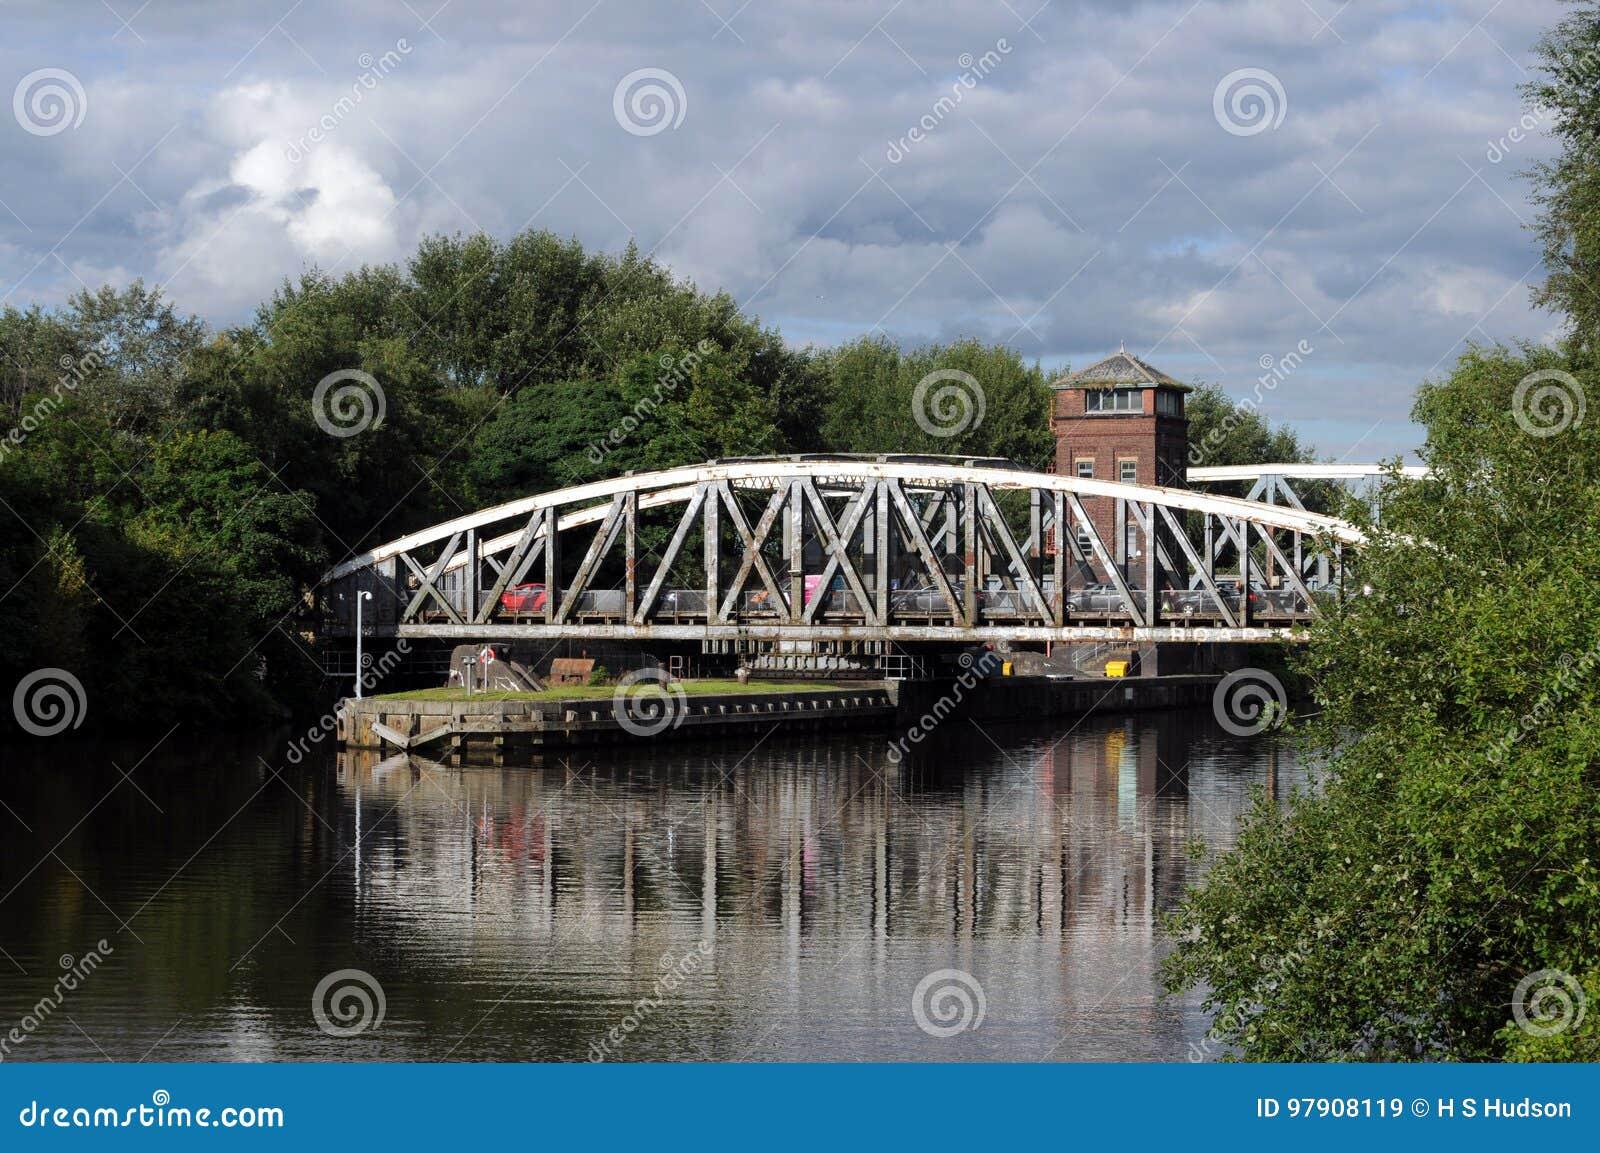 Girl creampie swinging bridge manchester